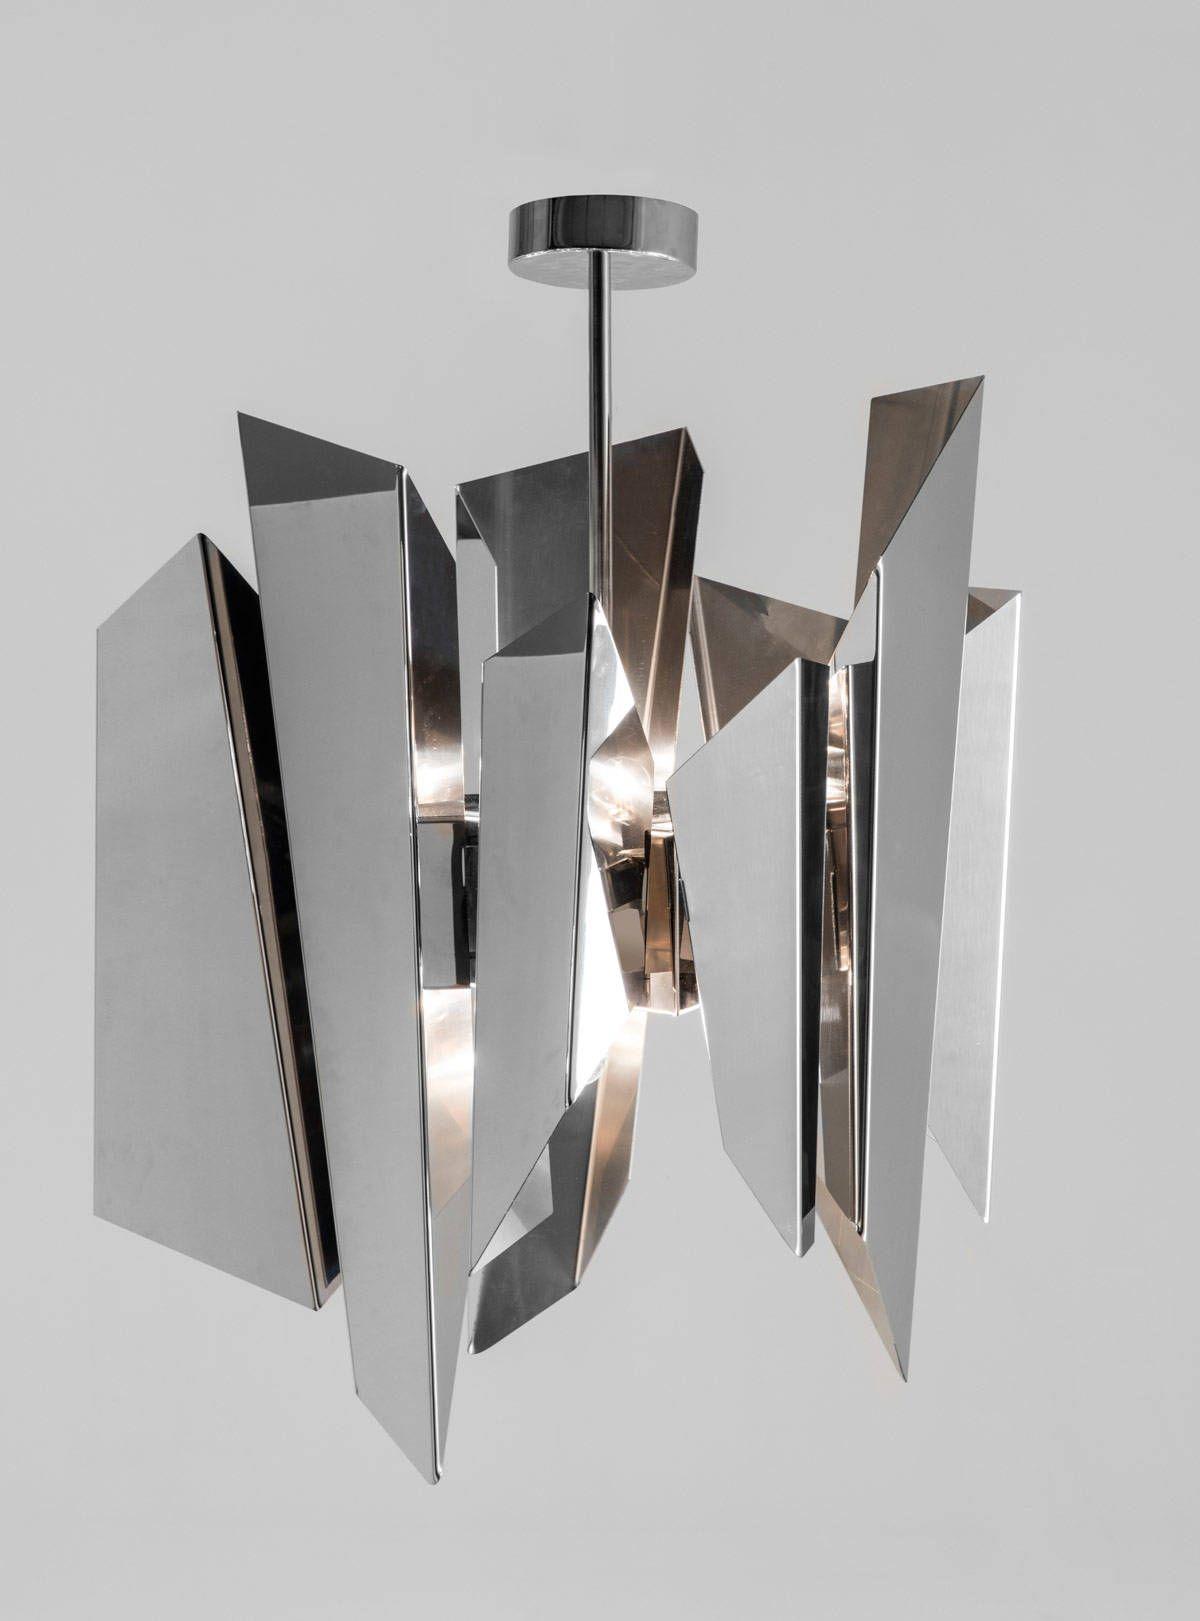 Modello A Sospensione Wright By Nahoor · Glass PendantsFloor Lamps ChandelierSeptember